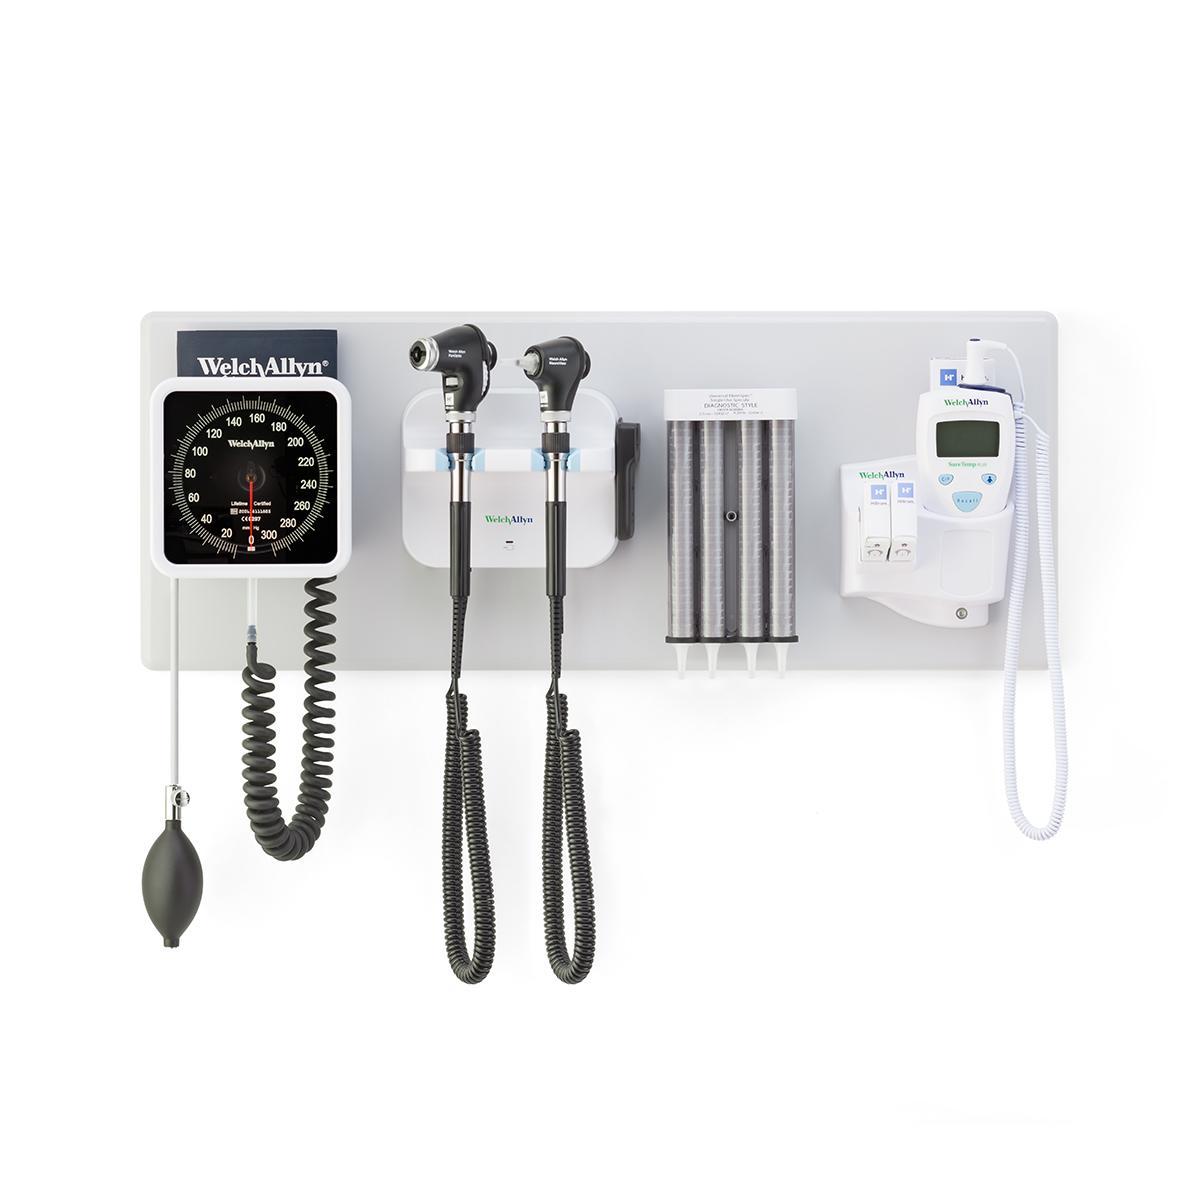 IWS, macroview plus otoscope, panoptic plus ophthalmoscope, suretemp thermometer